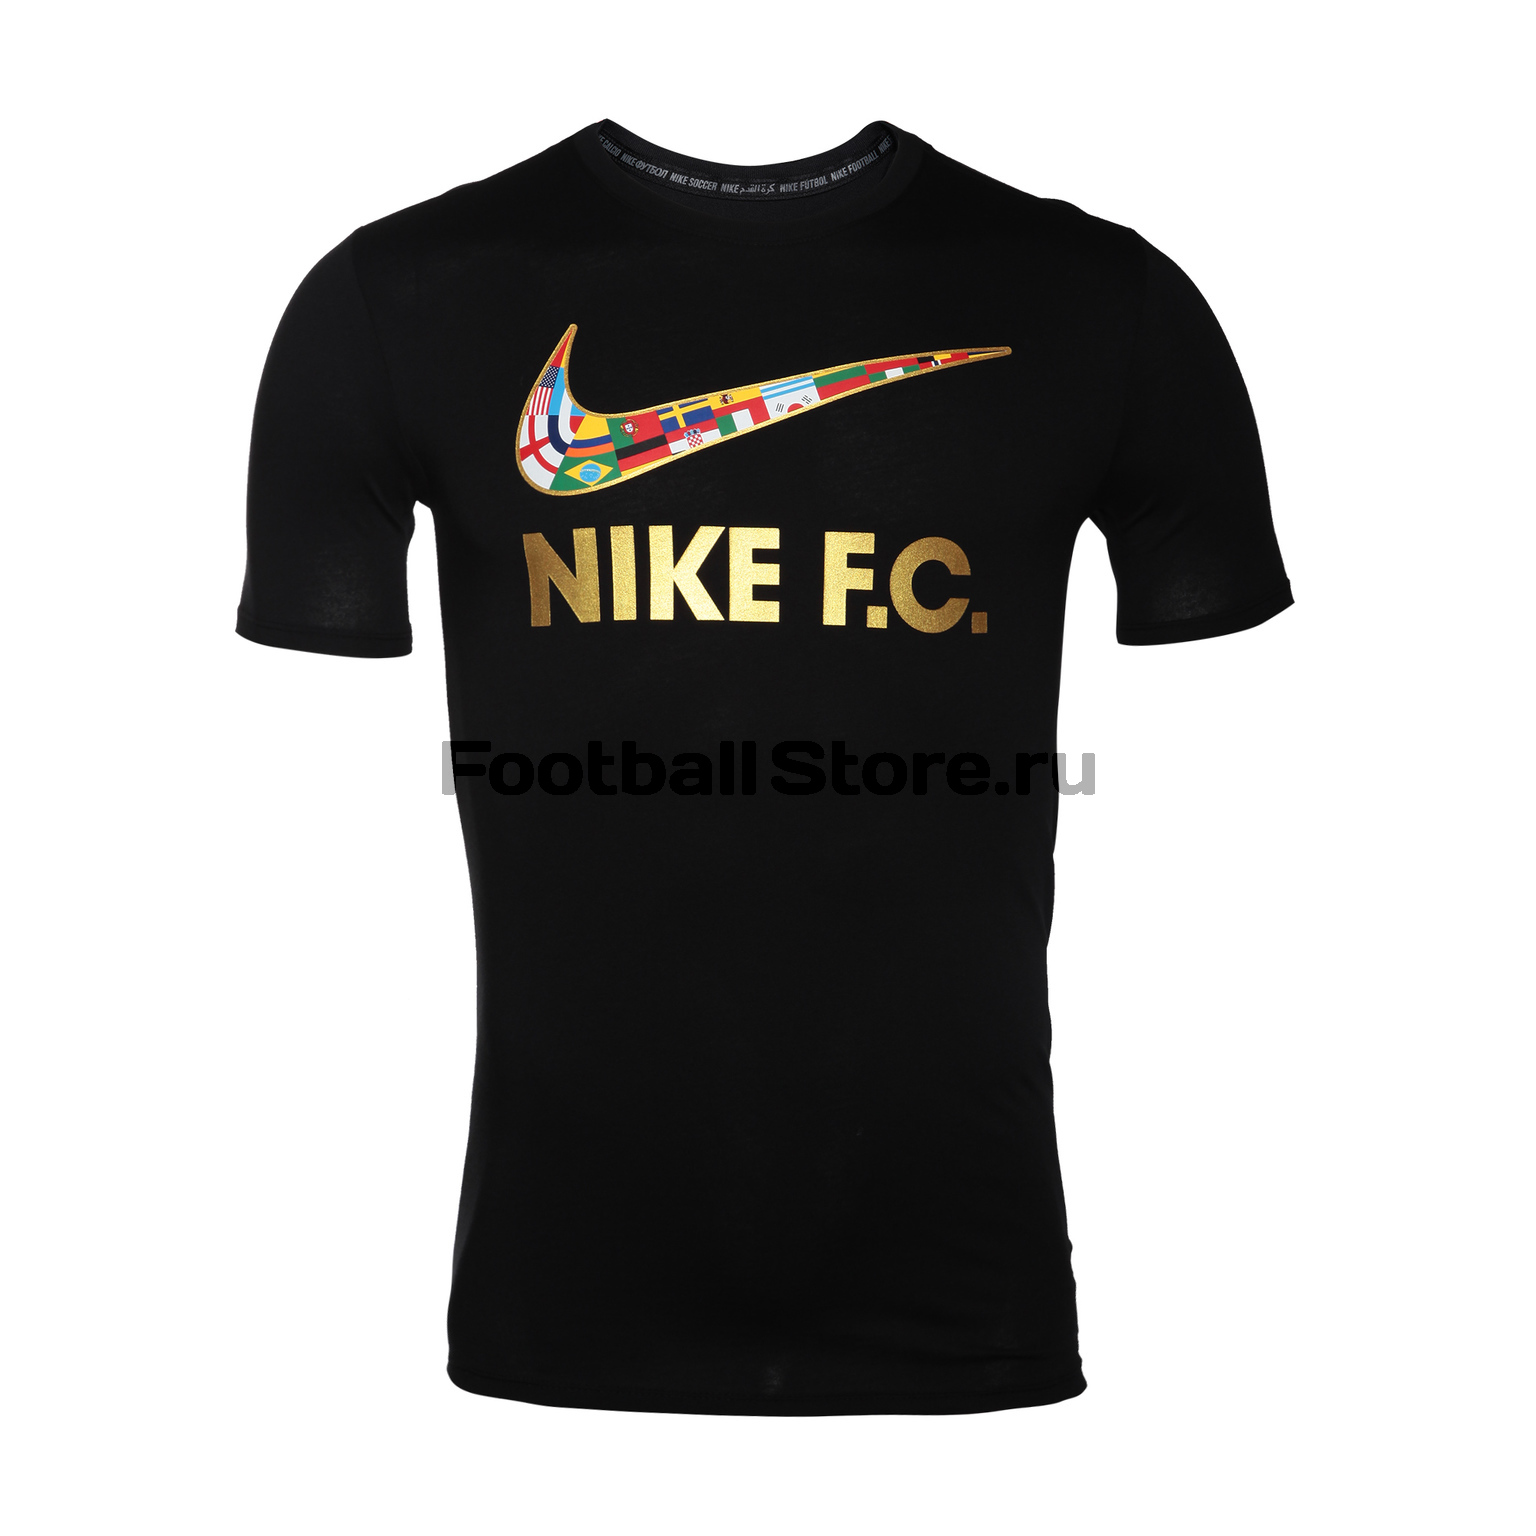 Футболка Nike FC Tee 911400-010